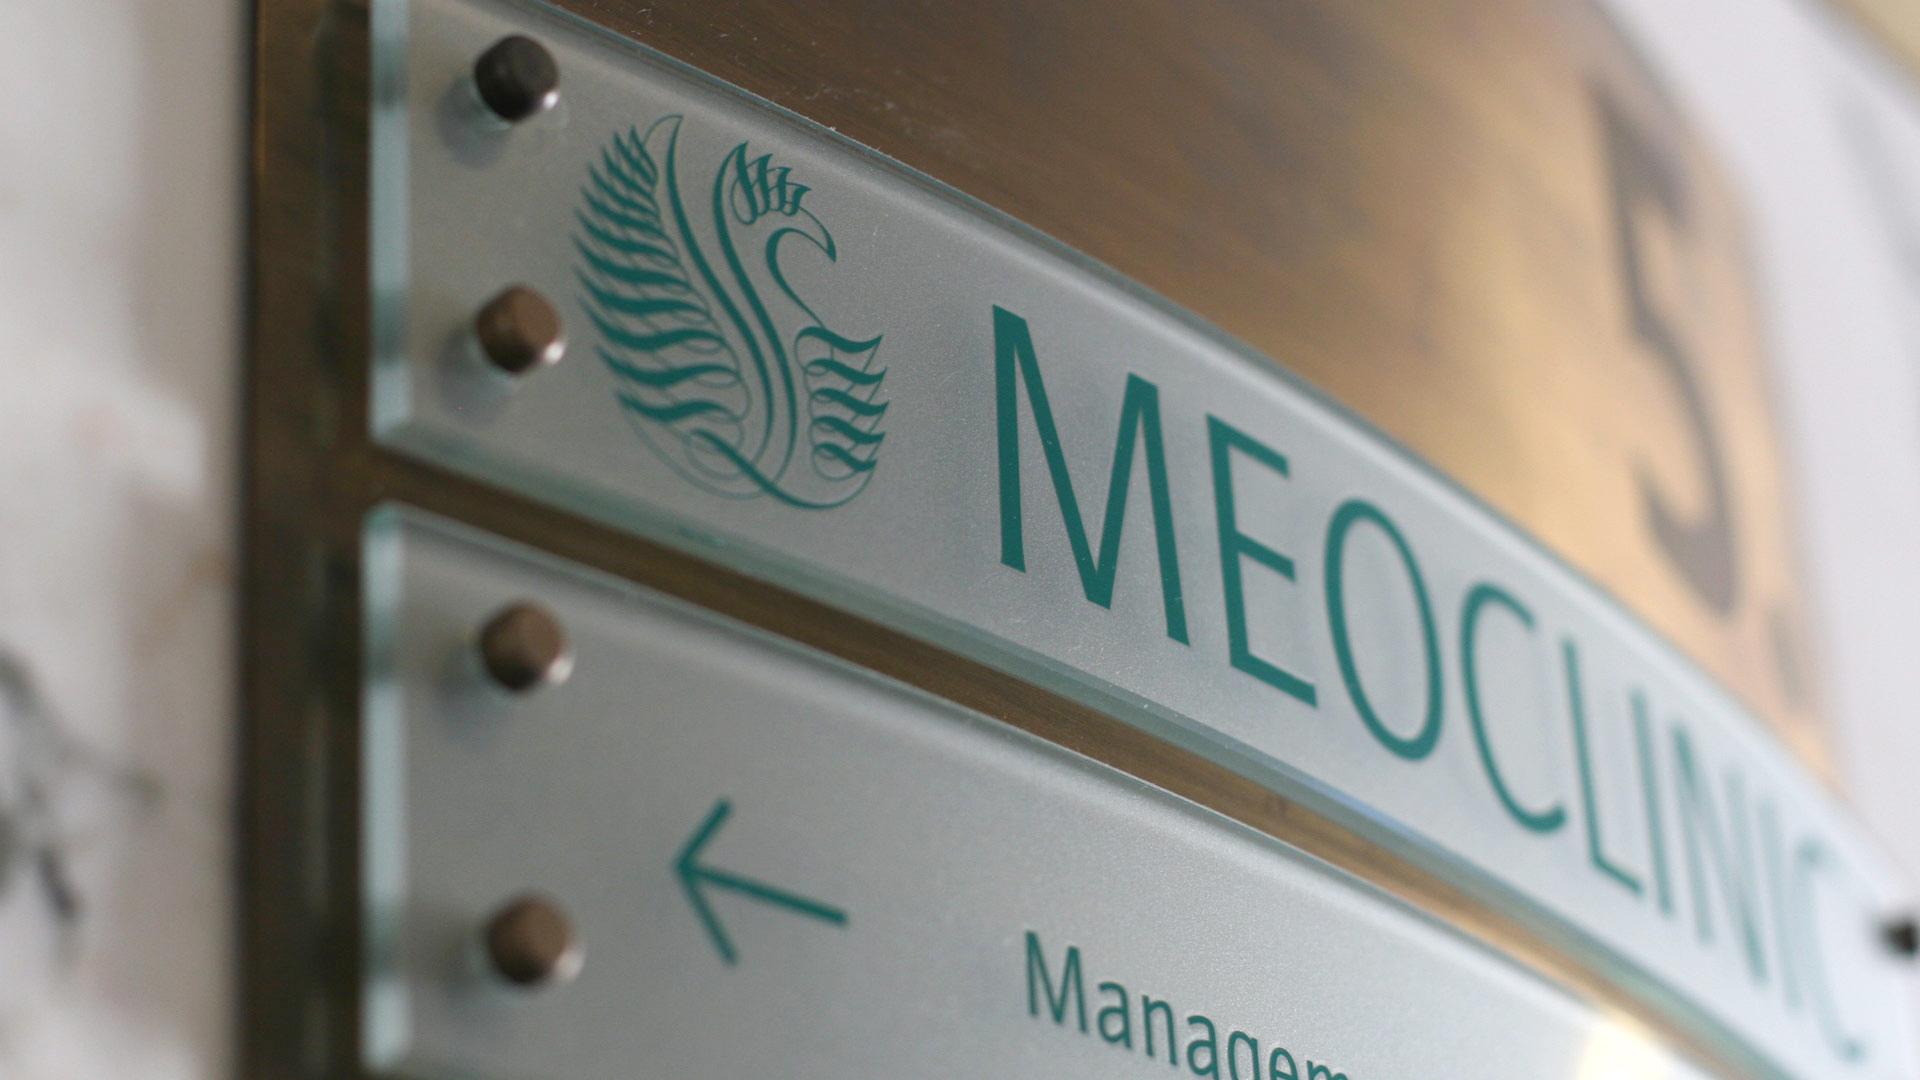 meoclinic-signage-2-2430